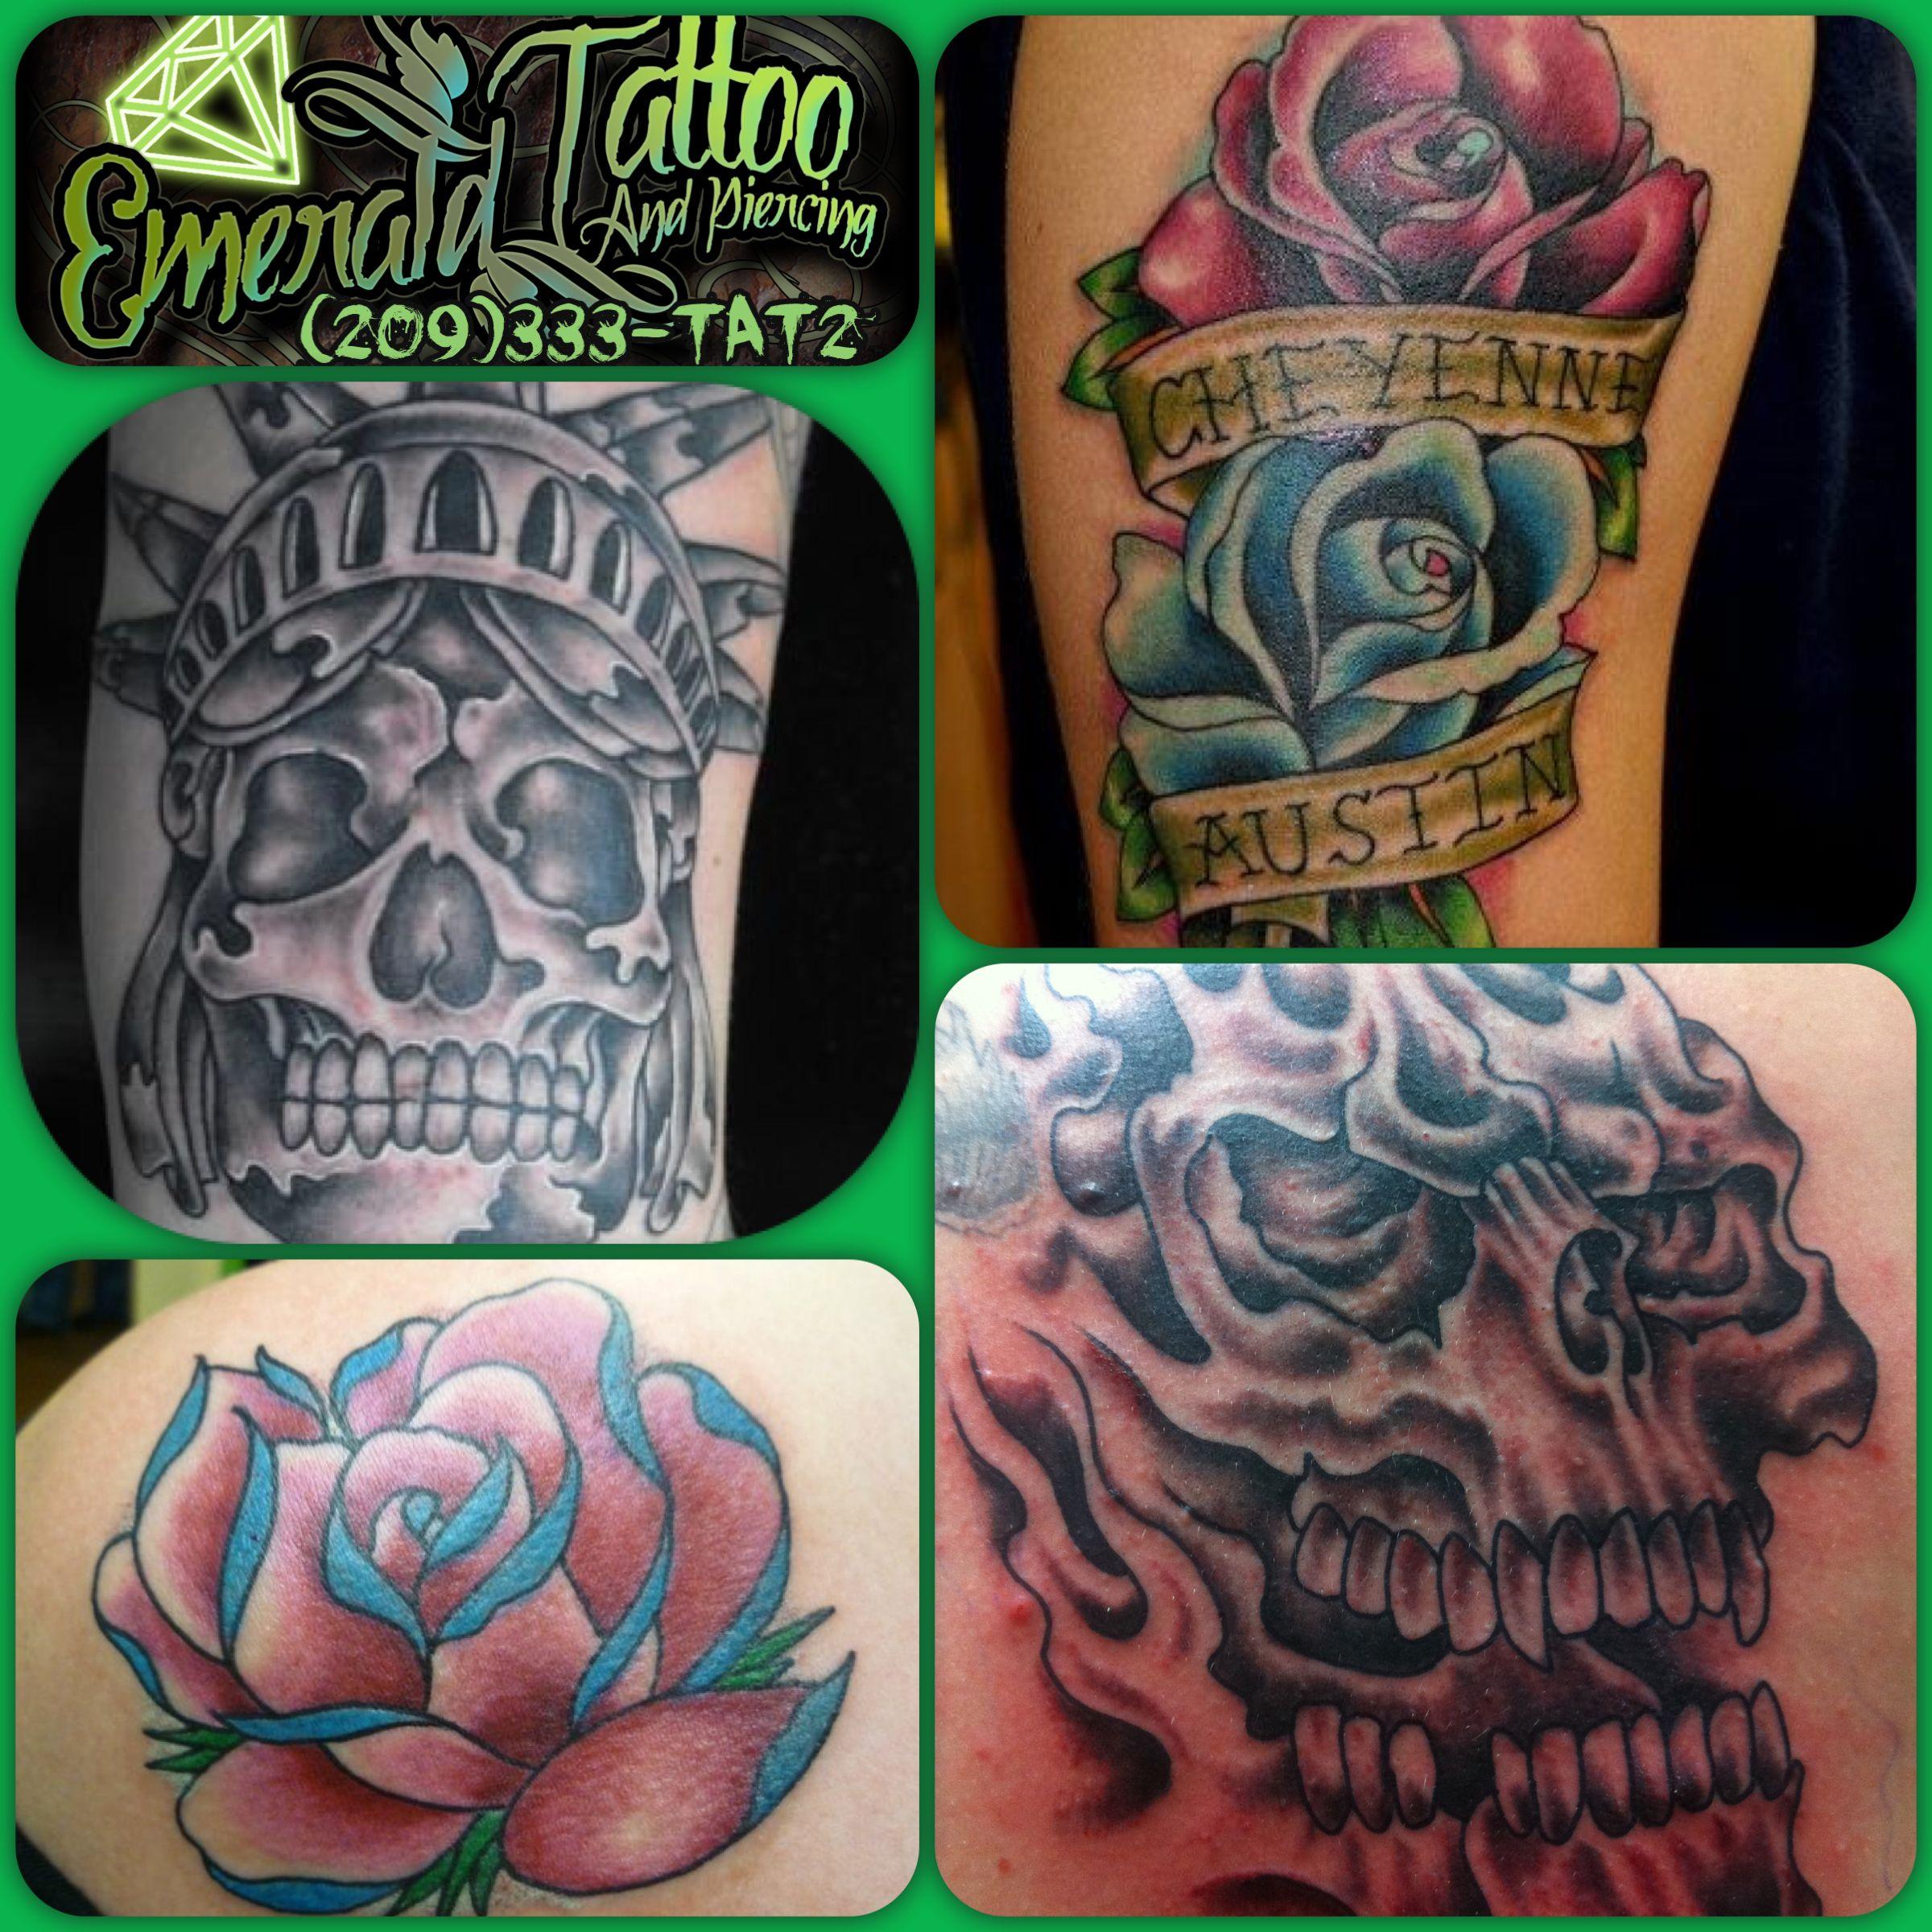 Emerald tattoo piercing lodi coupons near me in lodi for Tattoo piercing near me